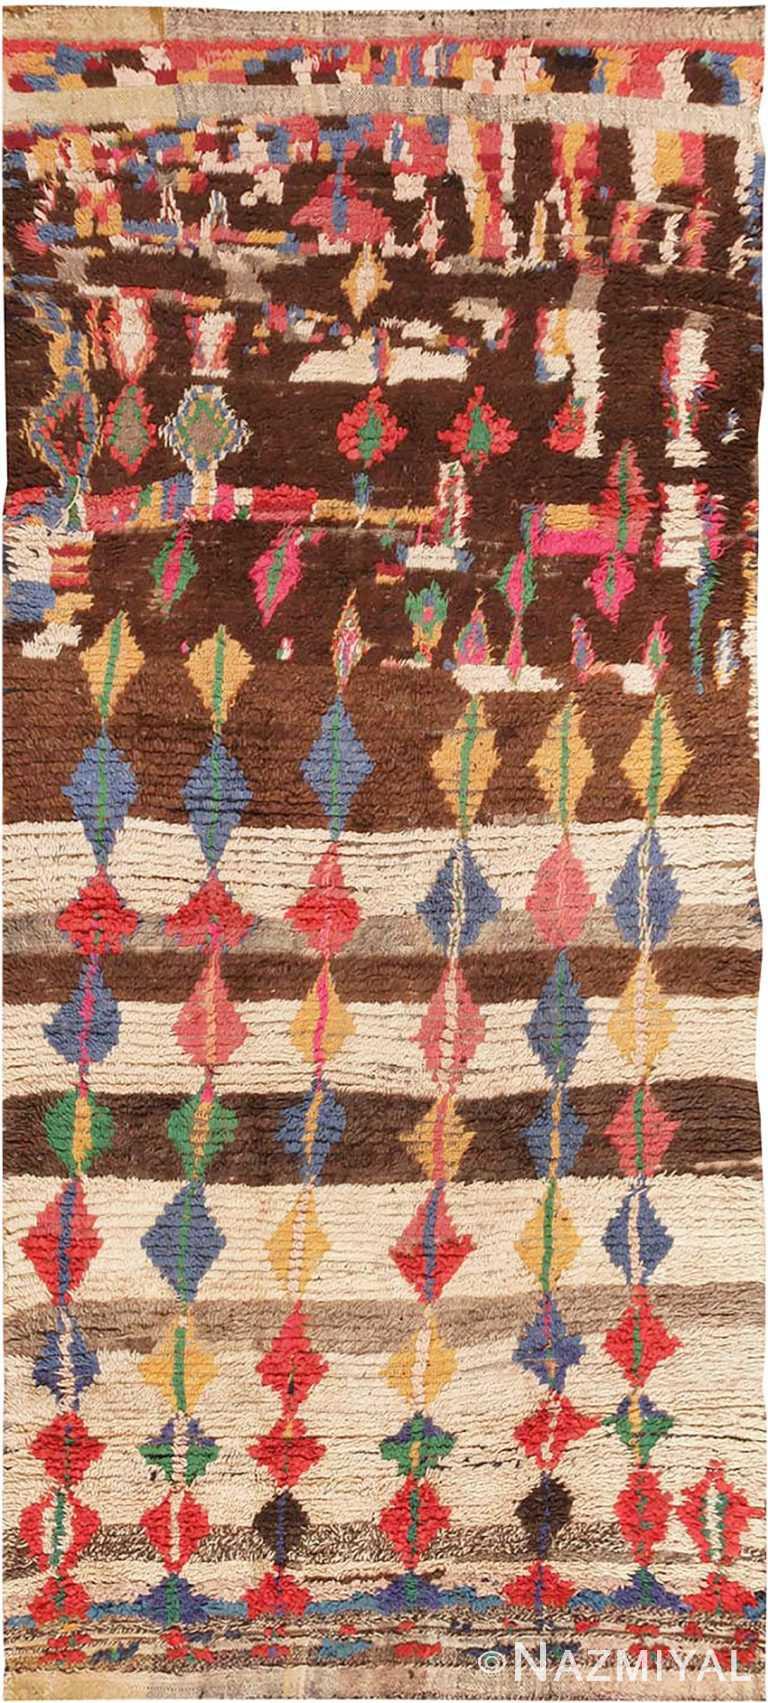 Mid Century Vintage Folk Art Moroccan Rug #45013 by Nazmiyal Antique Rugs